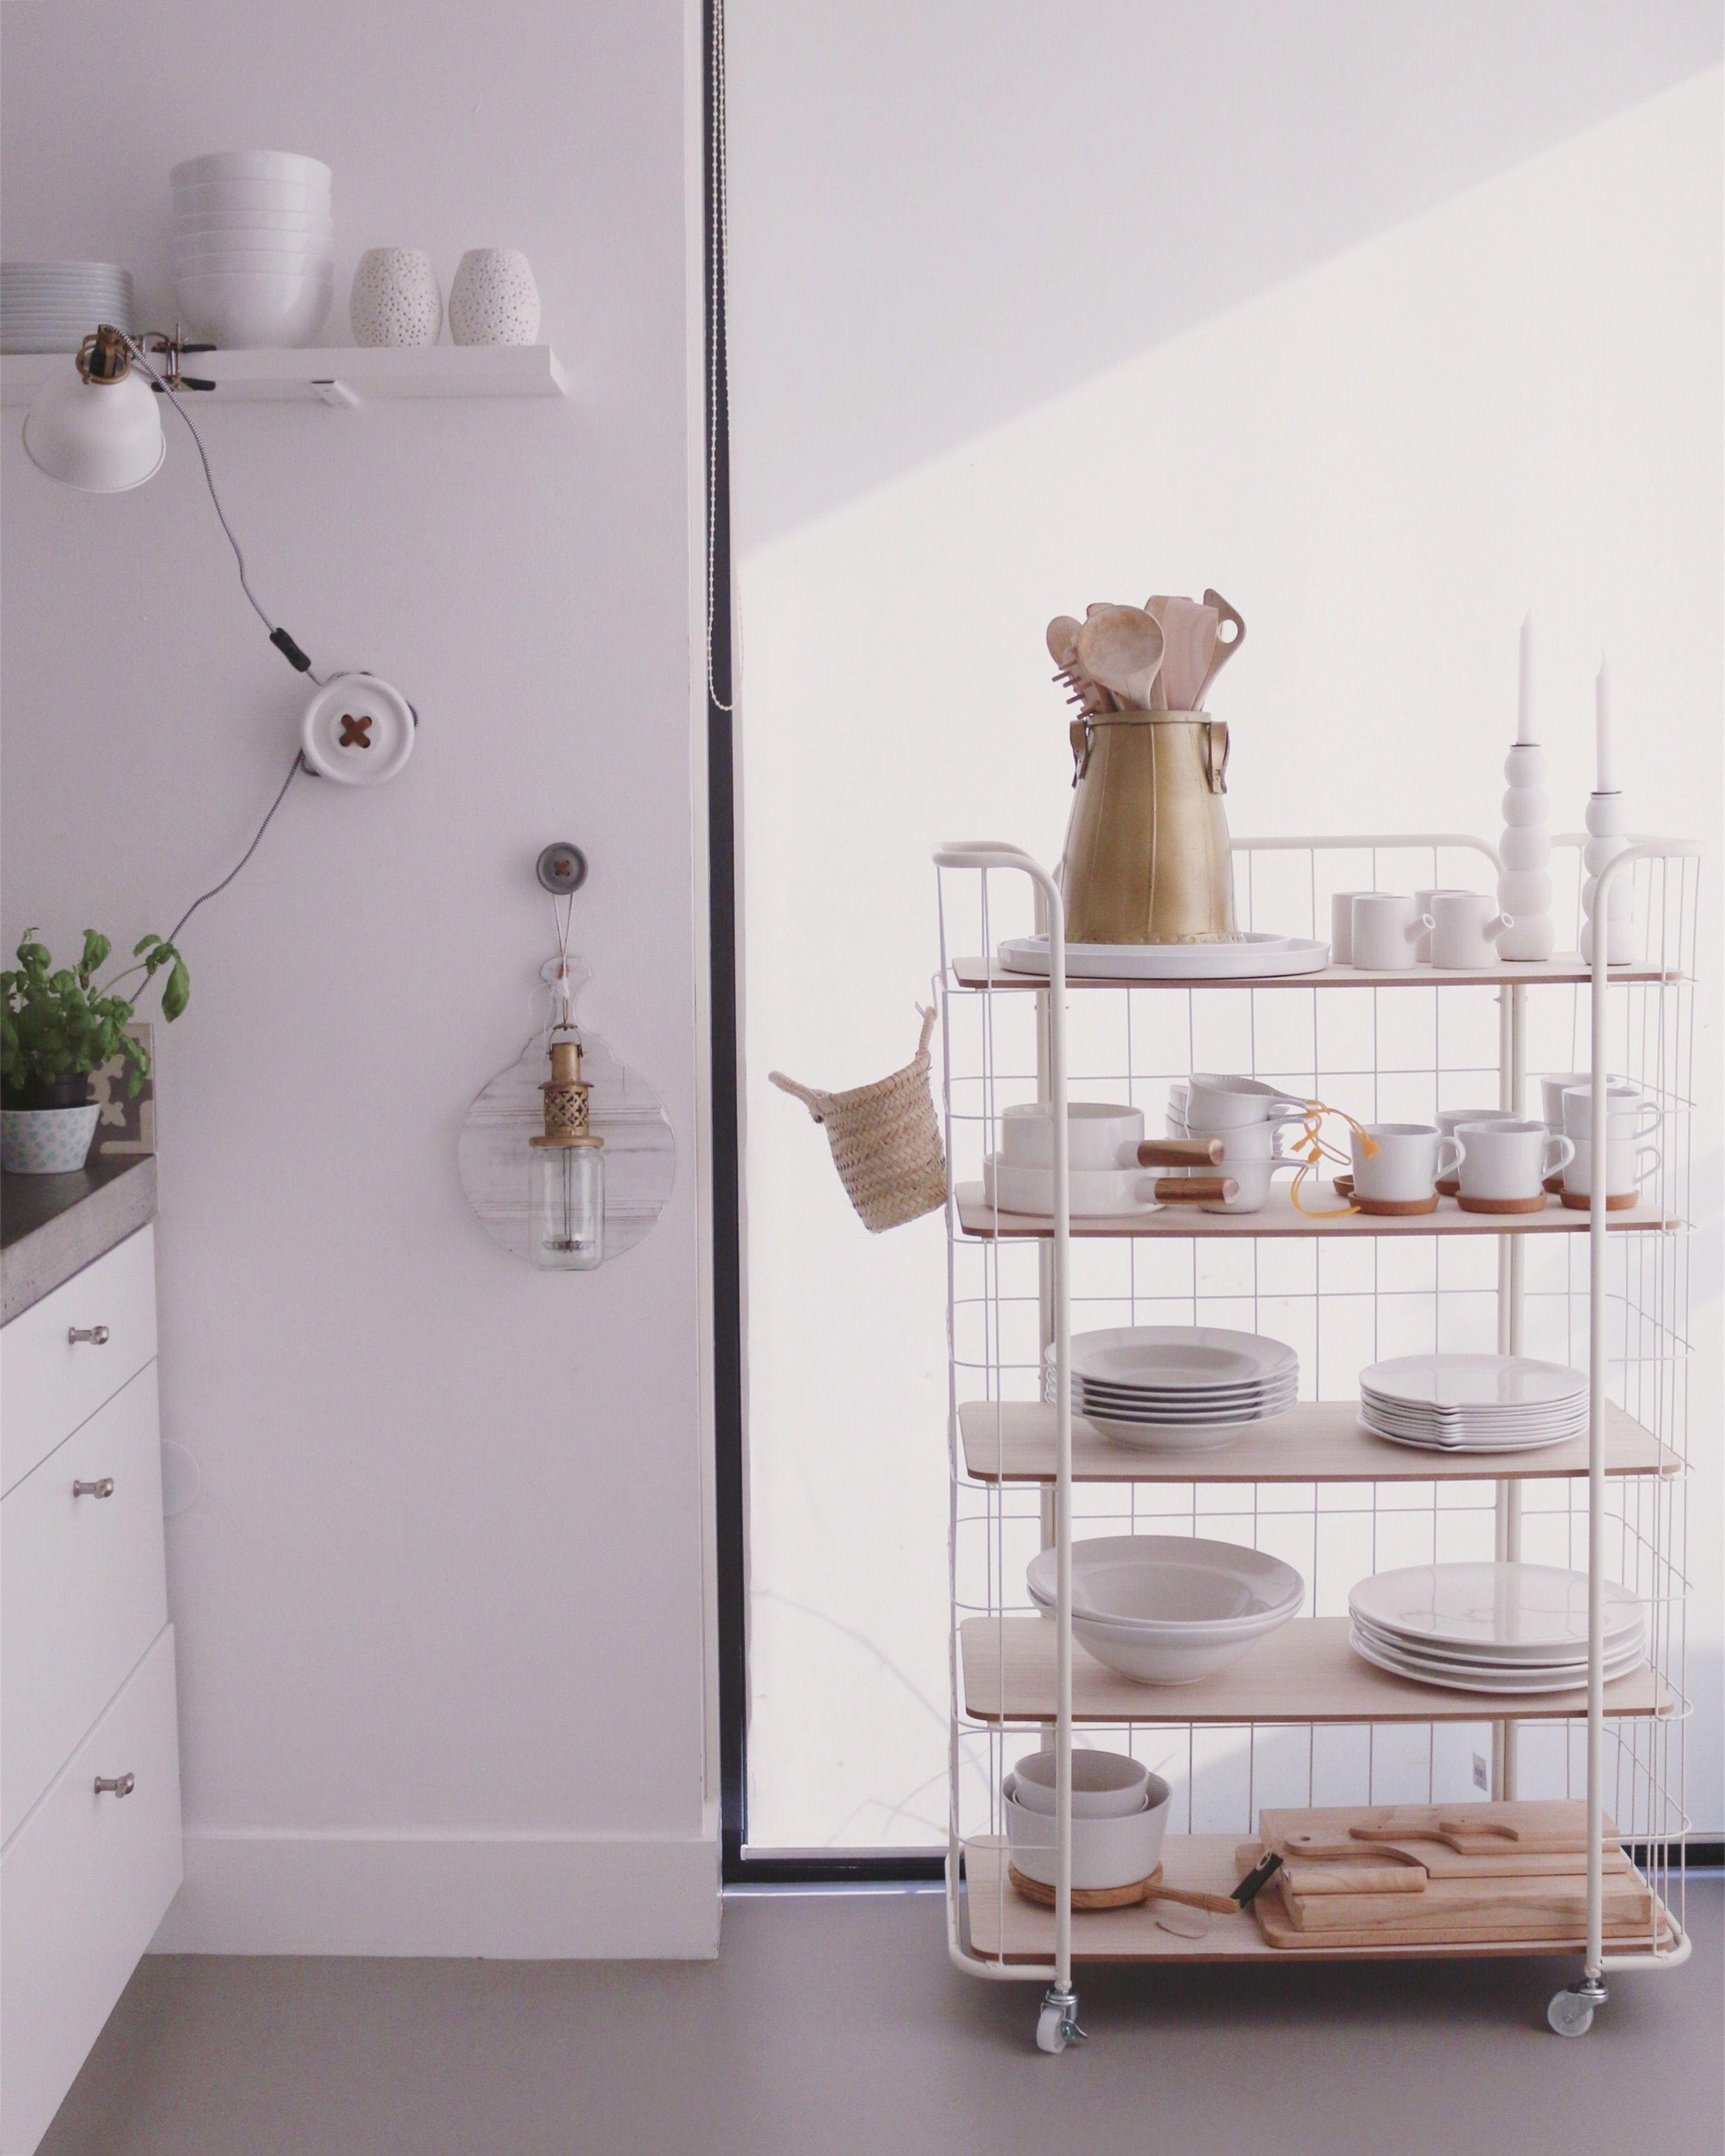 Bakkerskast in de keuken woonkamer pinterest keuken huisdecoratie en decoratie - Decoratie eetkamer hok ...